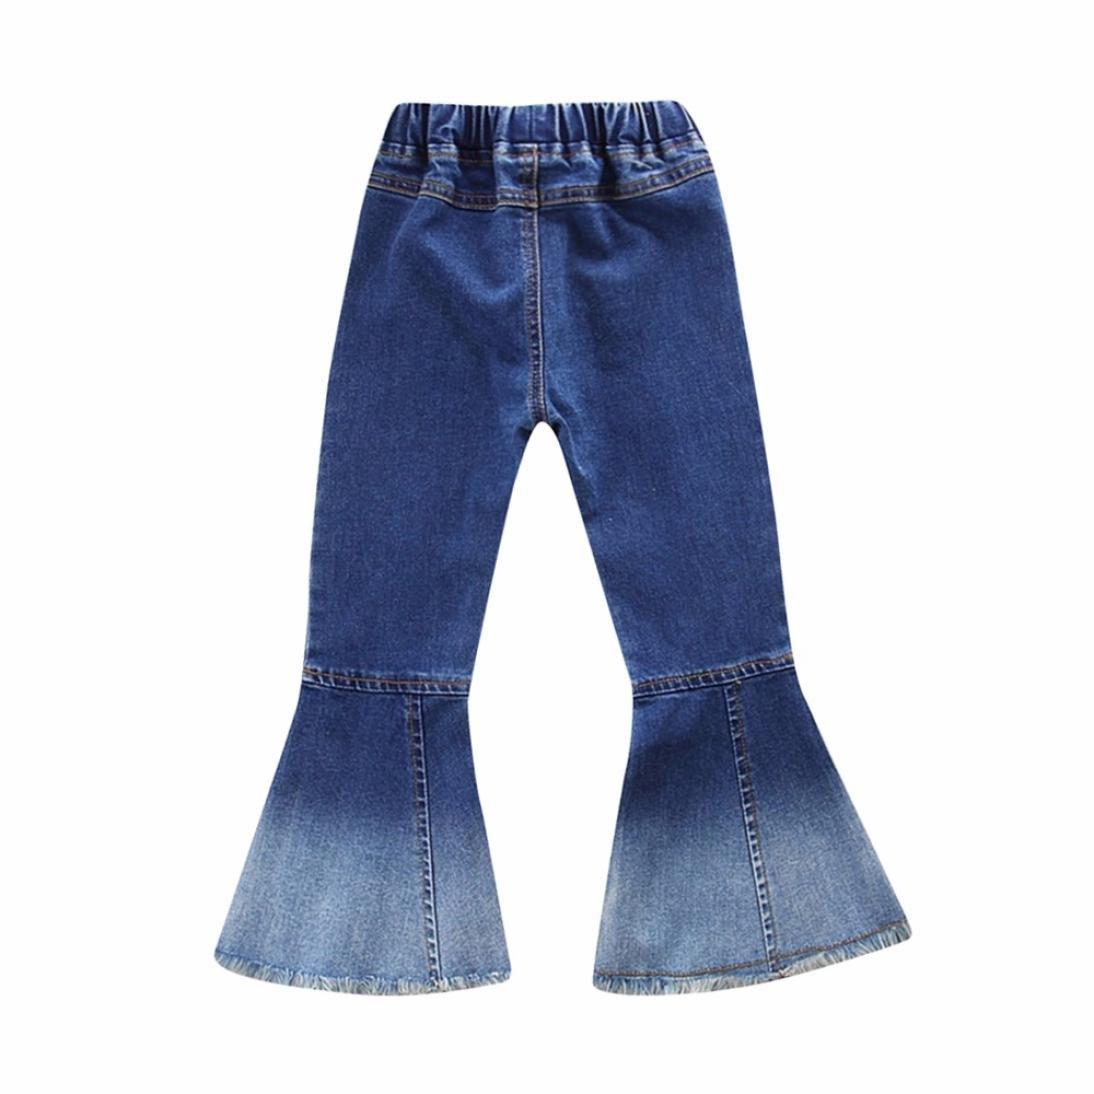 Leey Bambini Bambino infantile Ragazze Jeans vintage Splice Pantaloni a zampa di elefante denim Pants collocazione Cappotti Giacche impermeabili Gile Casual Baggy Cowboy pantaloni